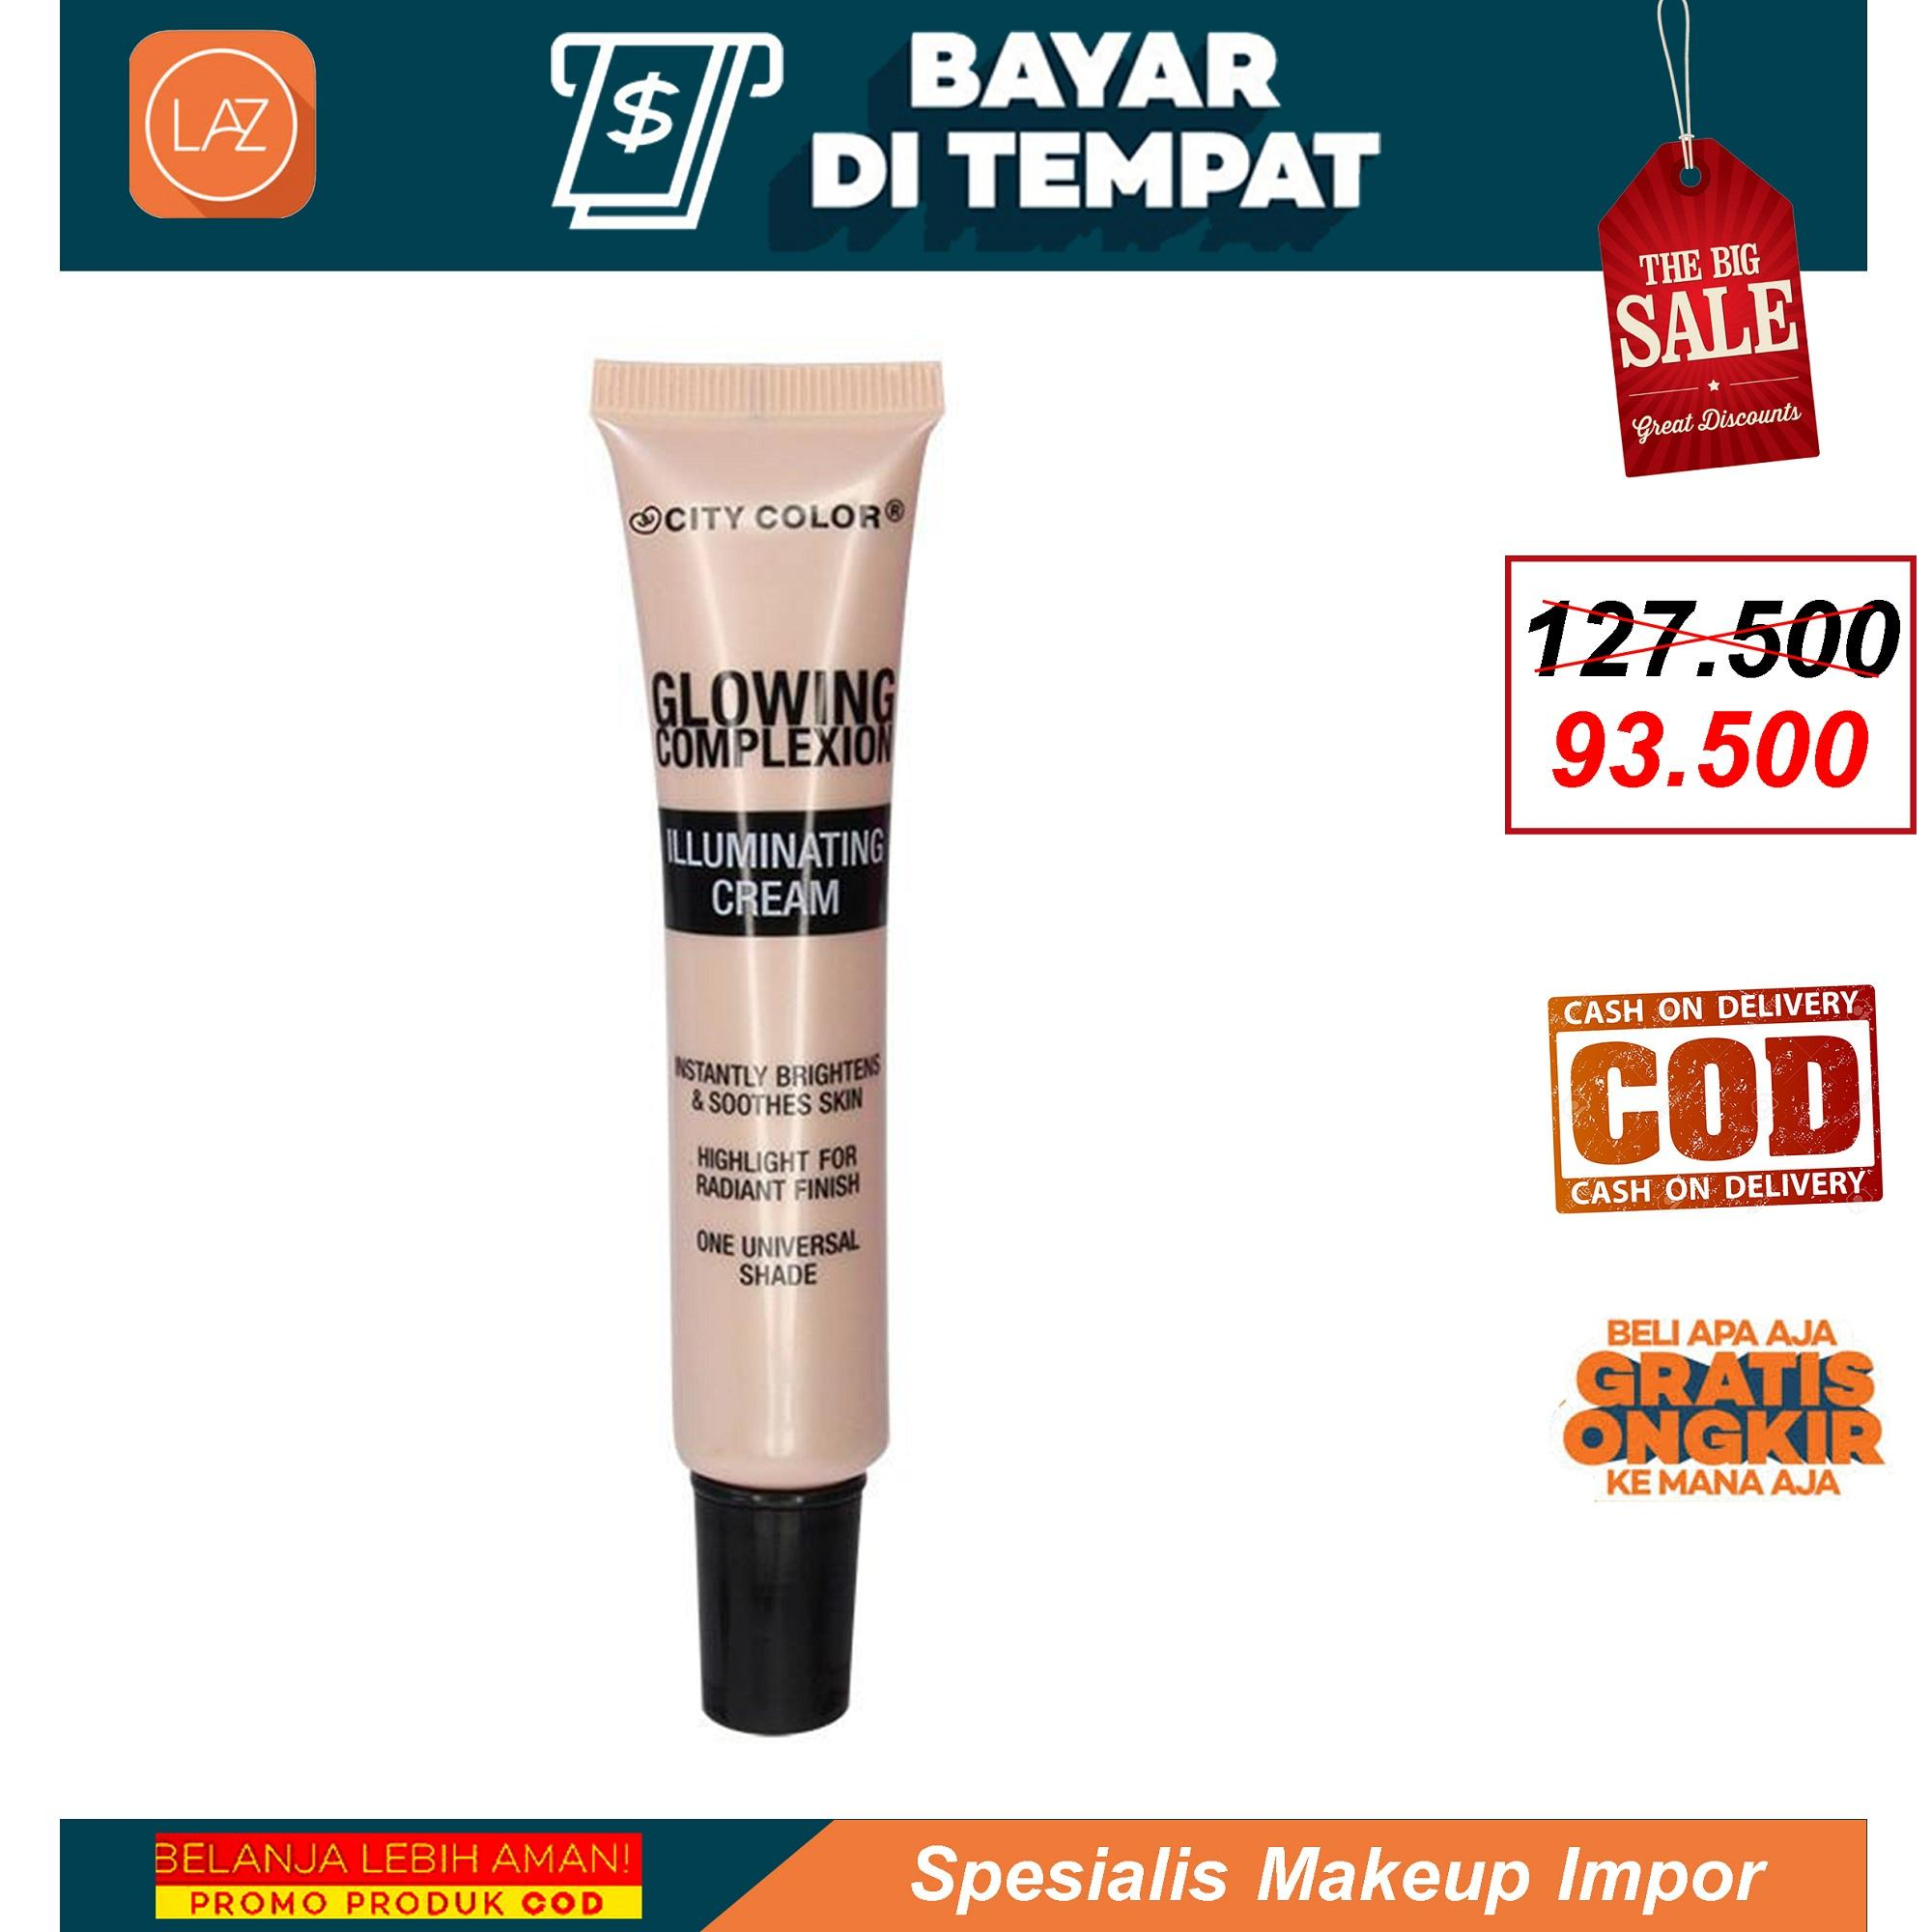 Make Up City Color Murah Lengkap Brow Quad Medium Glowing Complexion Illuminating Cream Highlighter Makeup Original Spesialis Impor